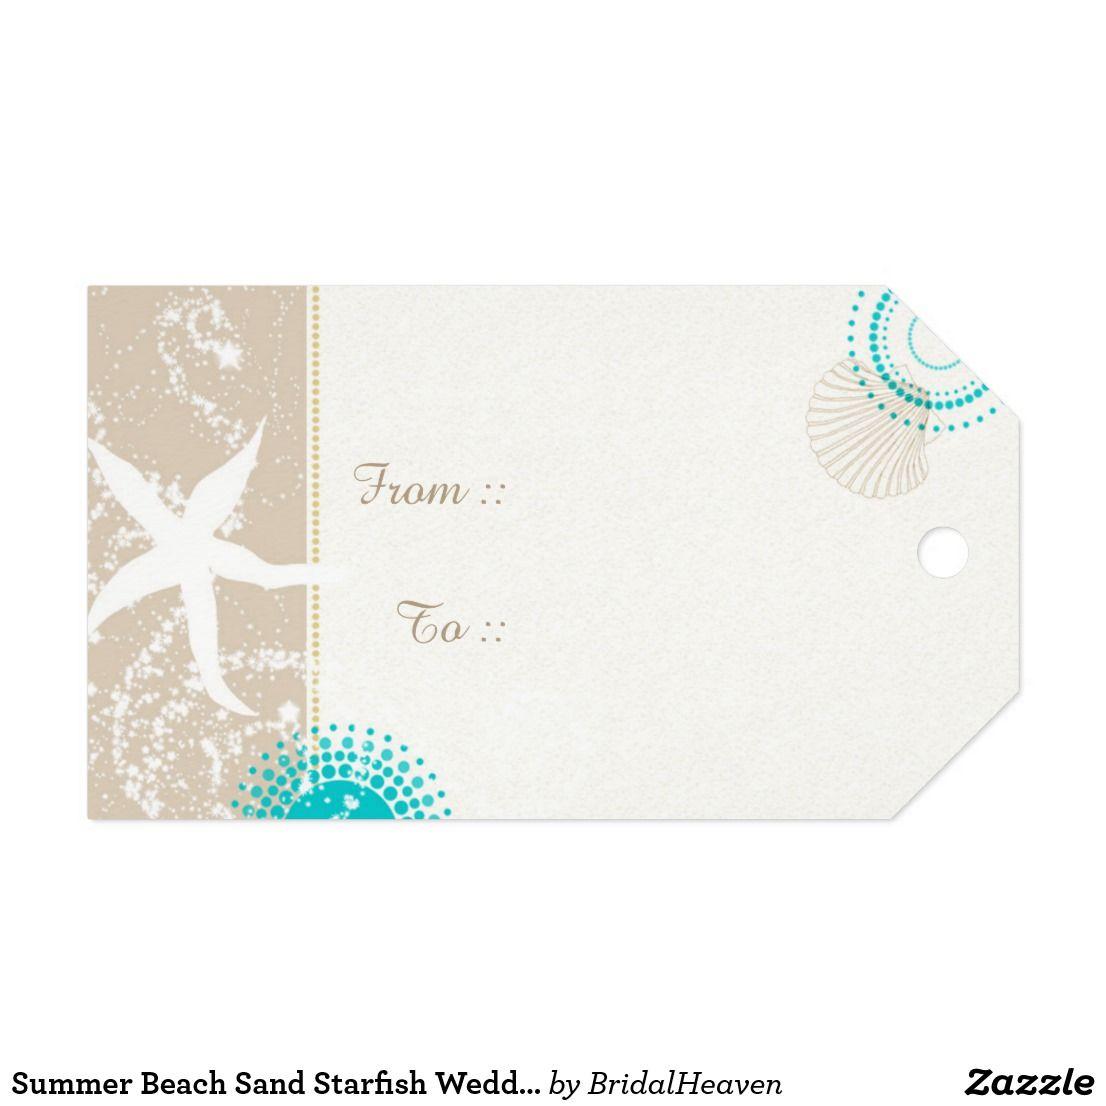 Summer Beach Sand Starfish Wedding Gift Tags | Custom wedding gifts ...